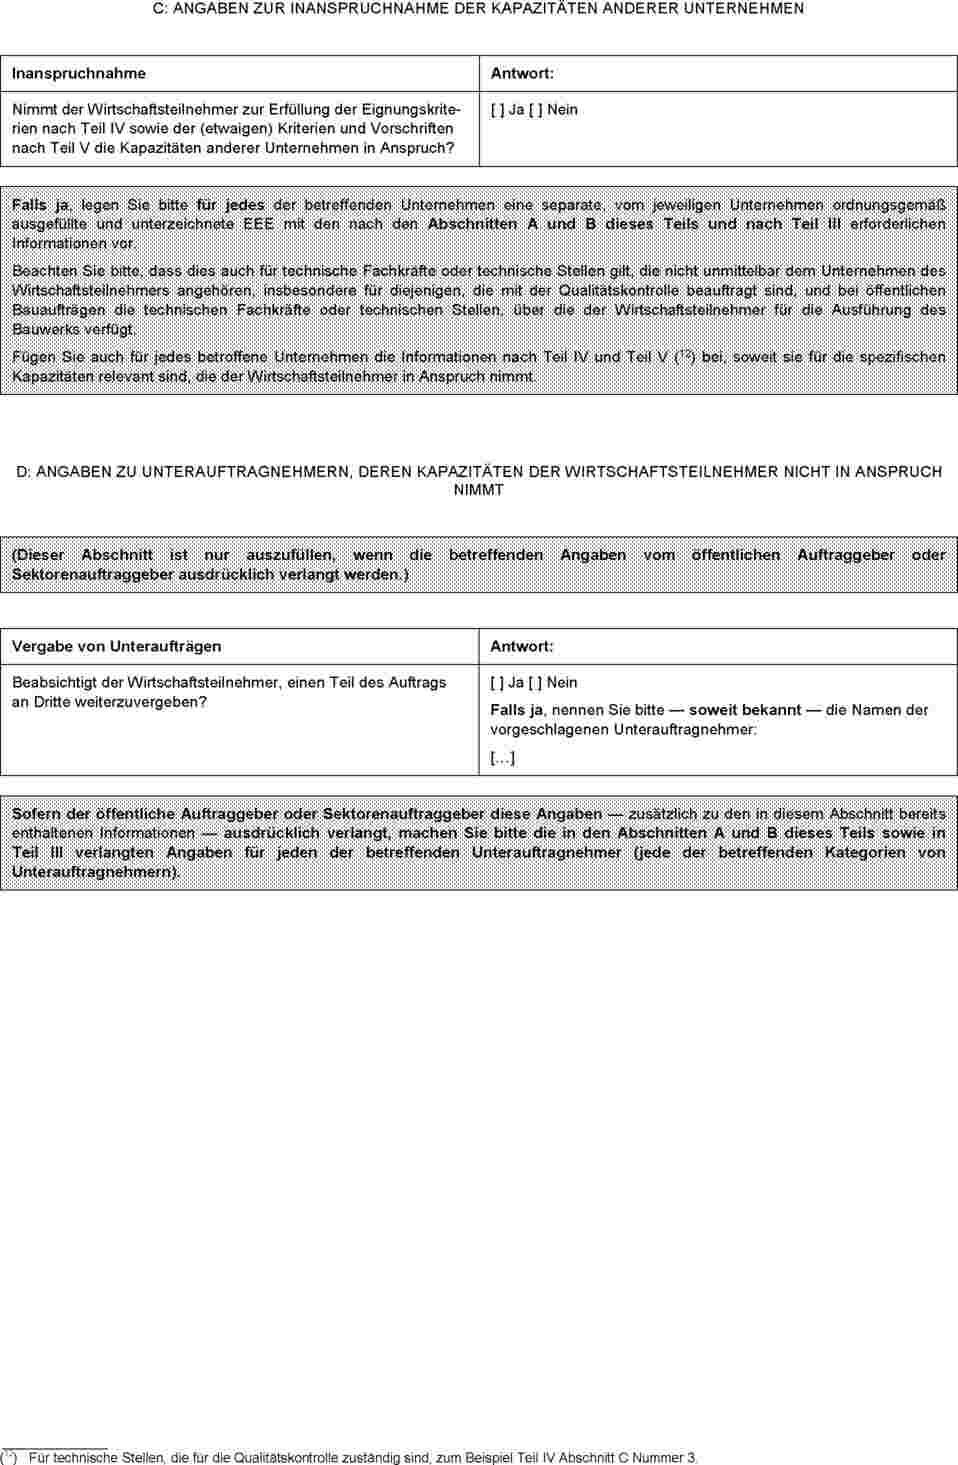 EUR-Lex - 32016R0007 - EN - EUR-Lex